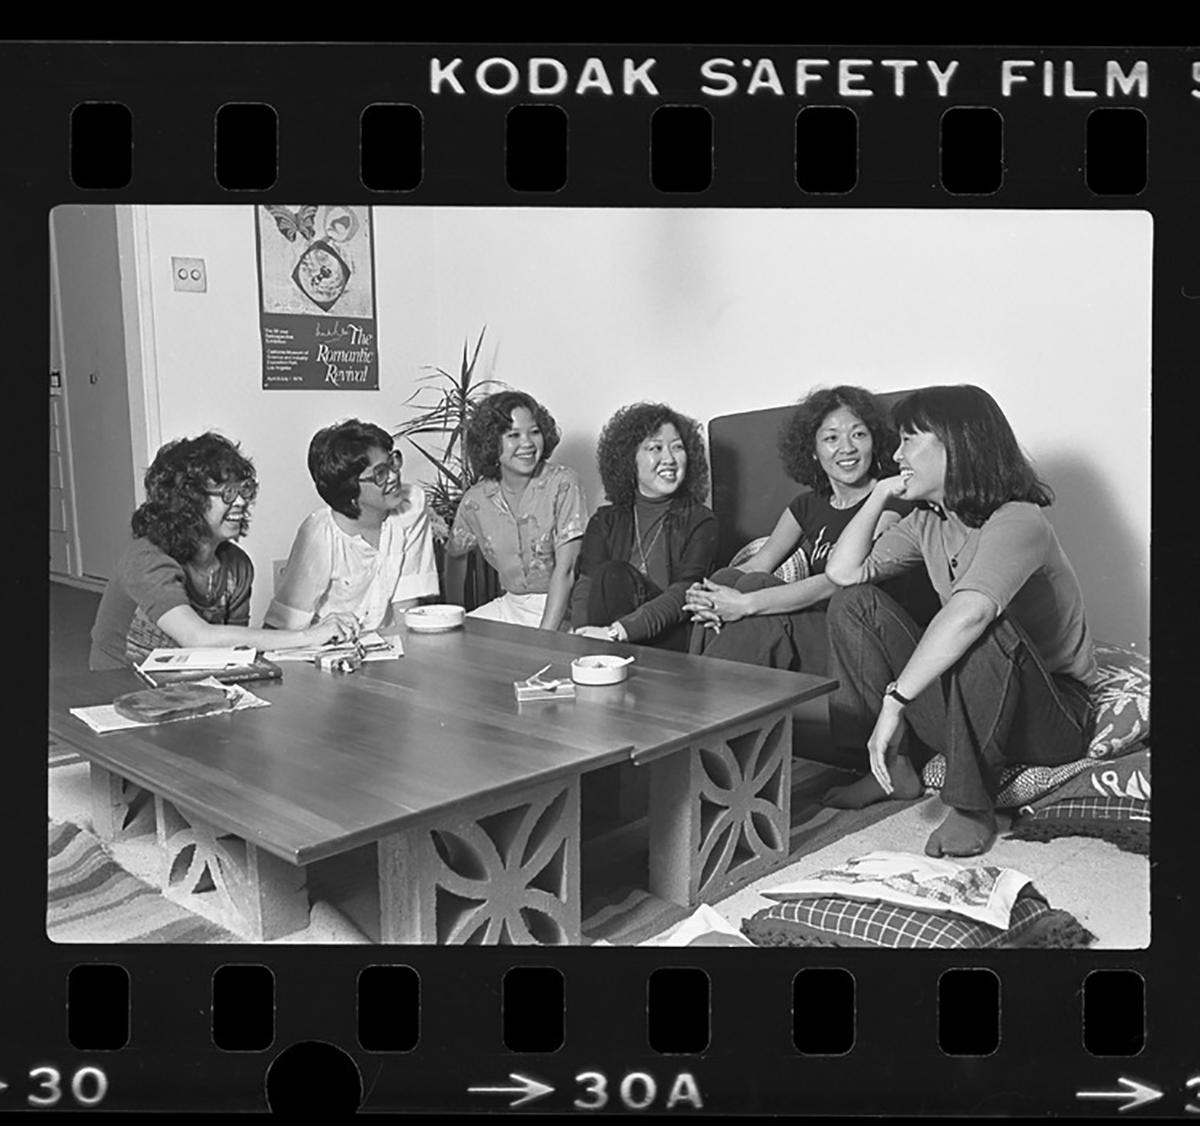 Members of Pacific Asian American Women Writers West, from left, Momoko Iko, Joyce Nako, Karen Saito, Miya Iwataki, Emma Gee and Diane Takei, meeting in Los Angeles in 1980